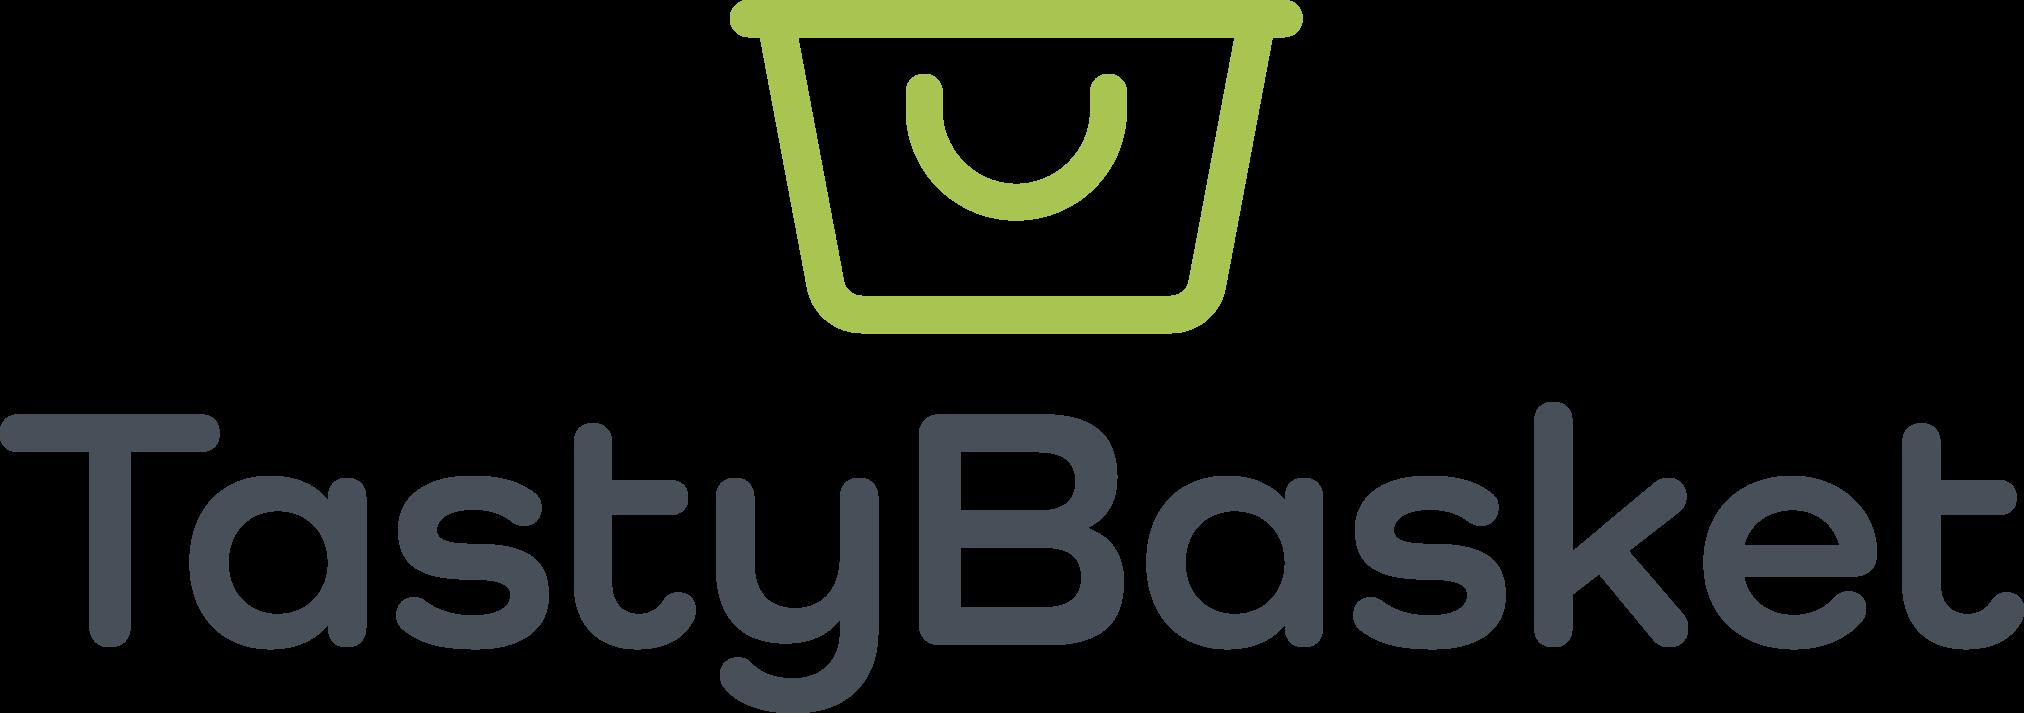 Read Tasty Basket Reviews